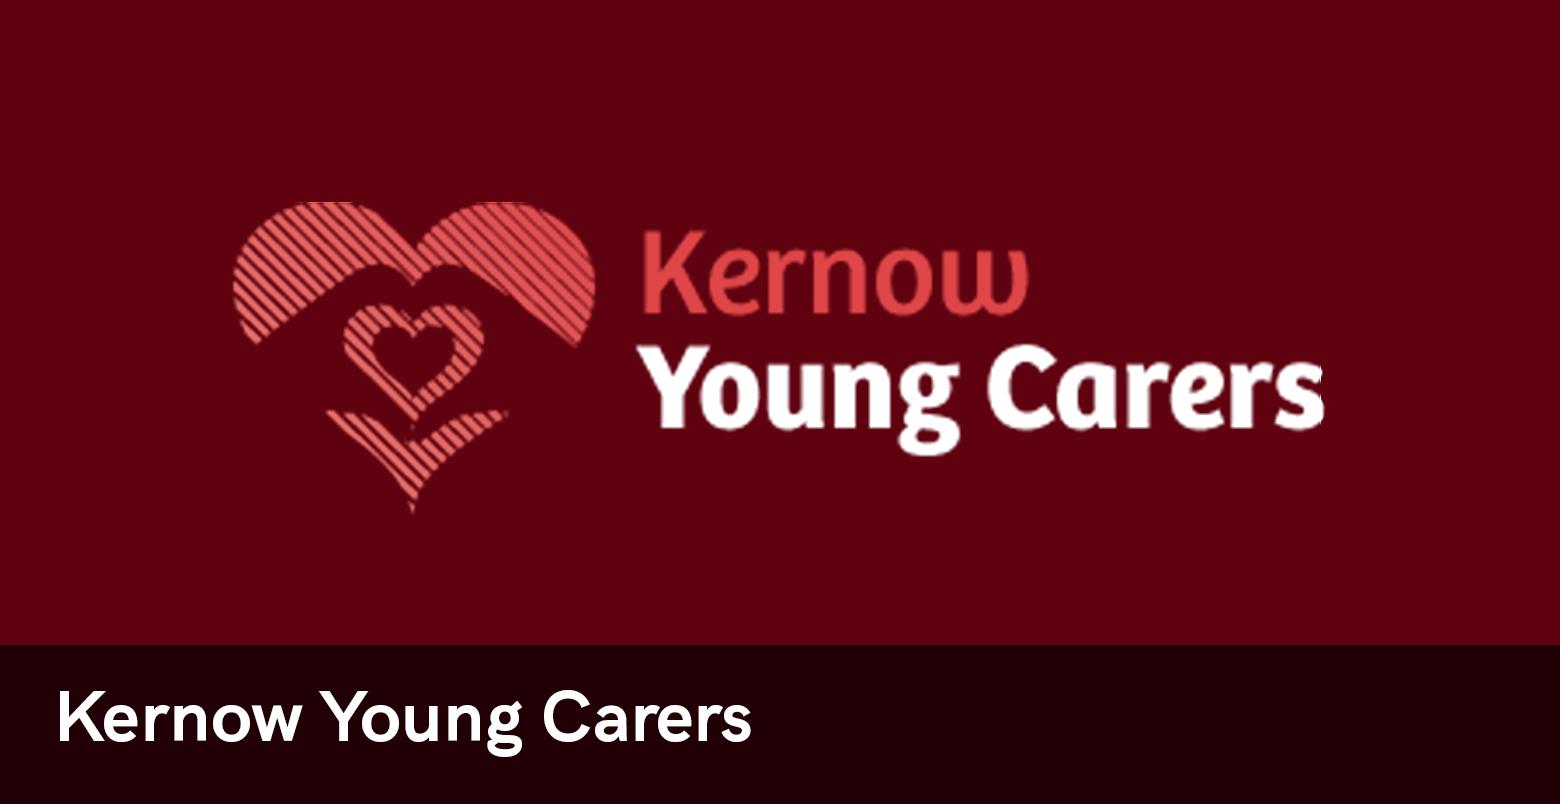 Kernow Young Carers